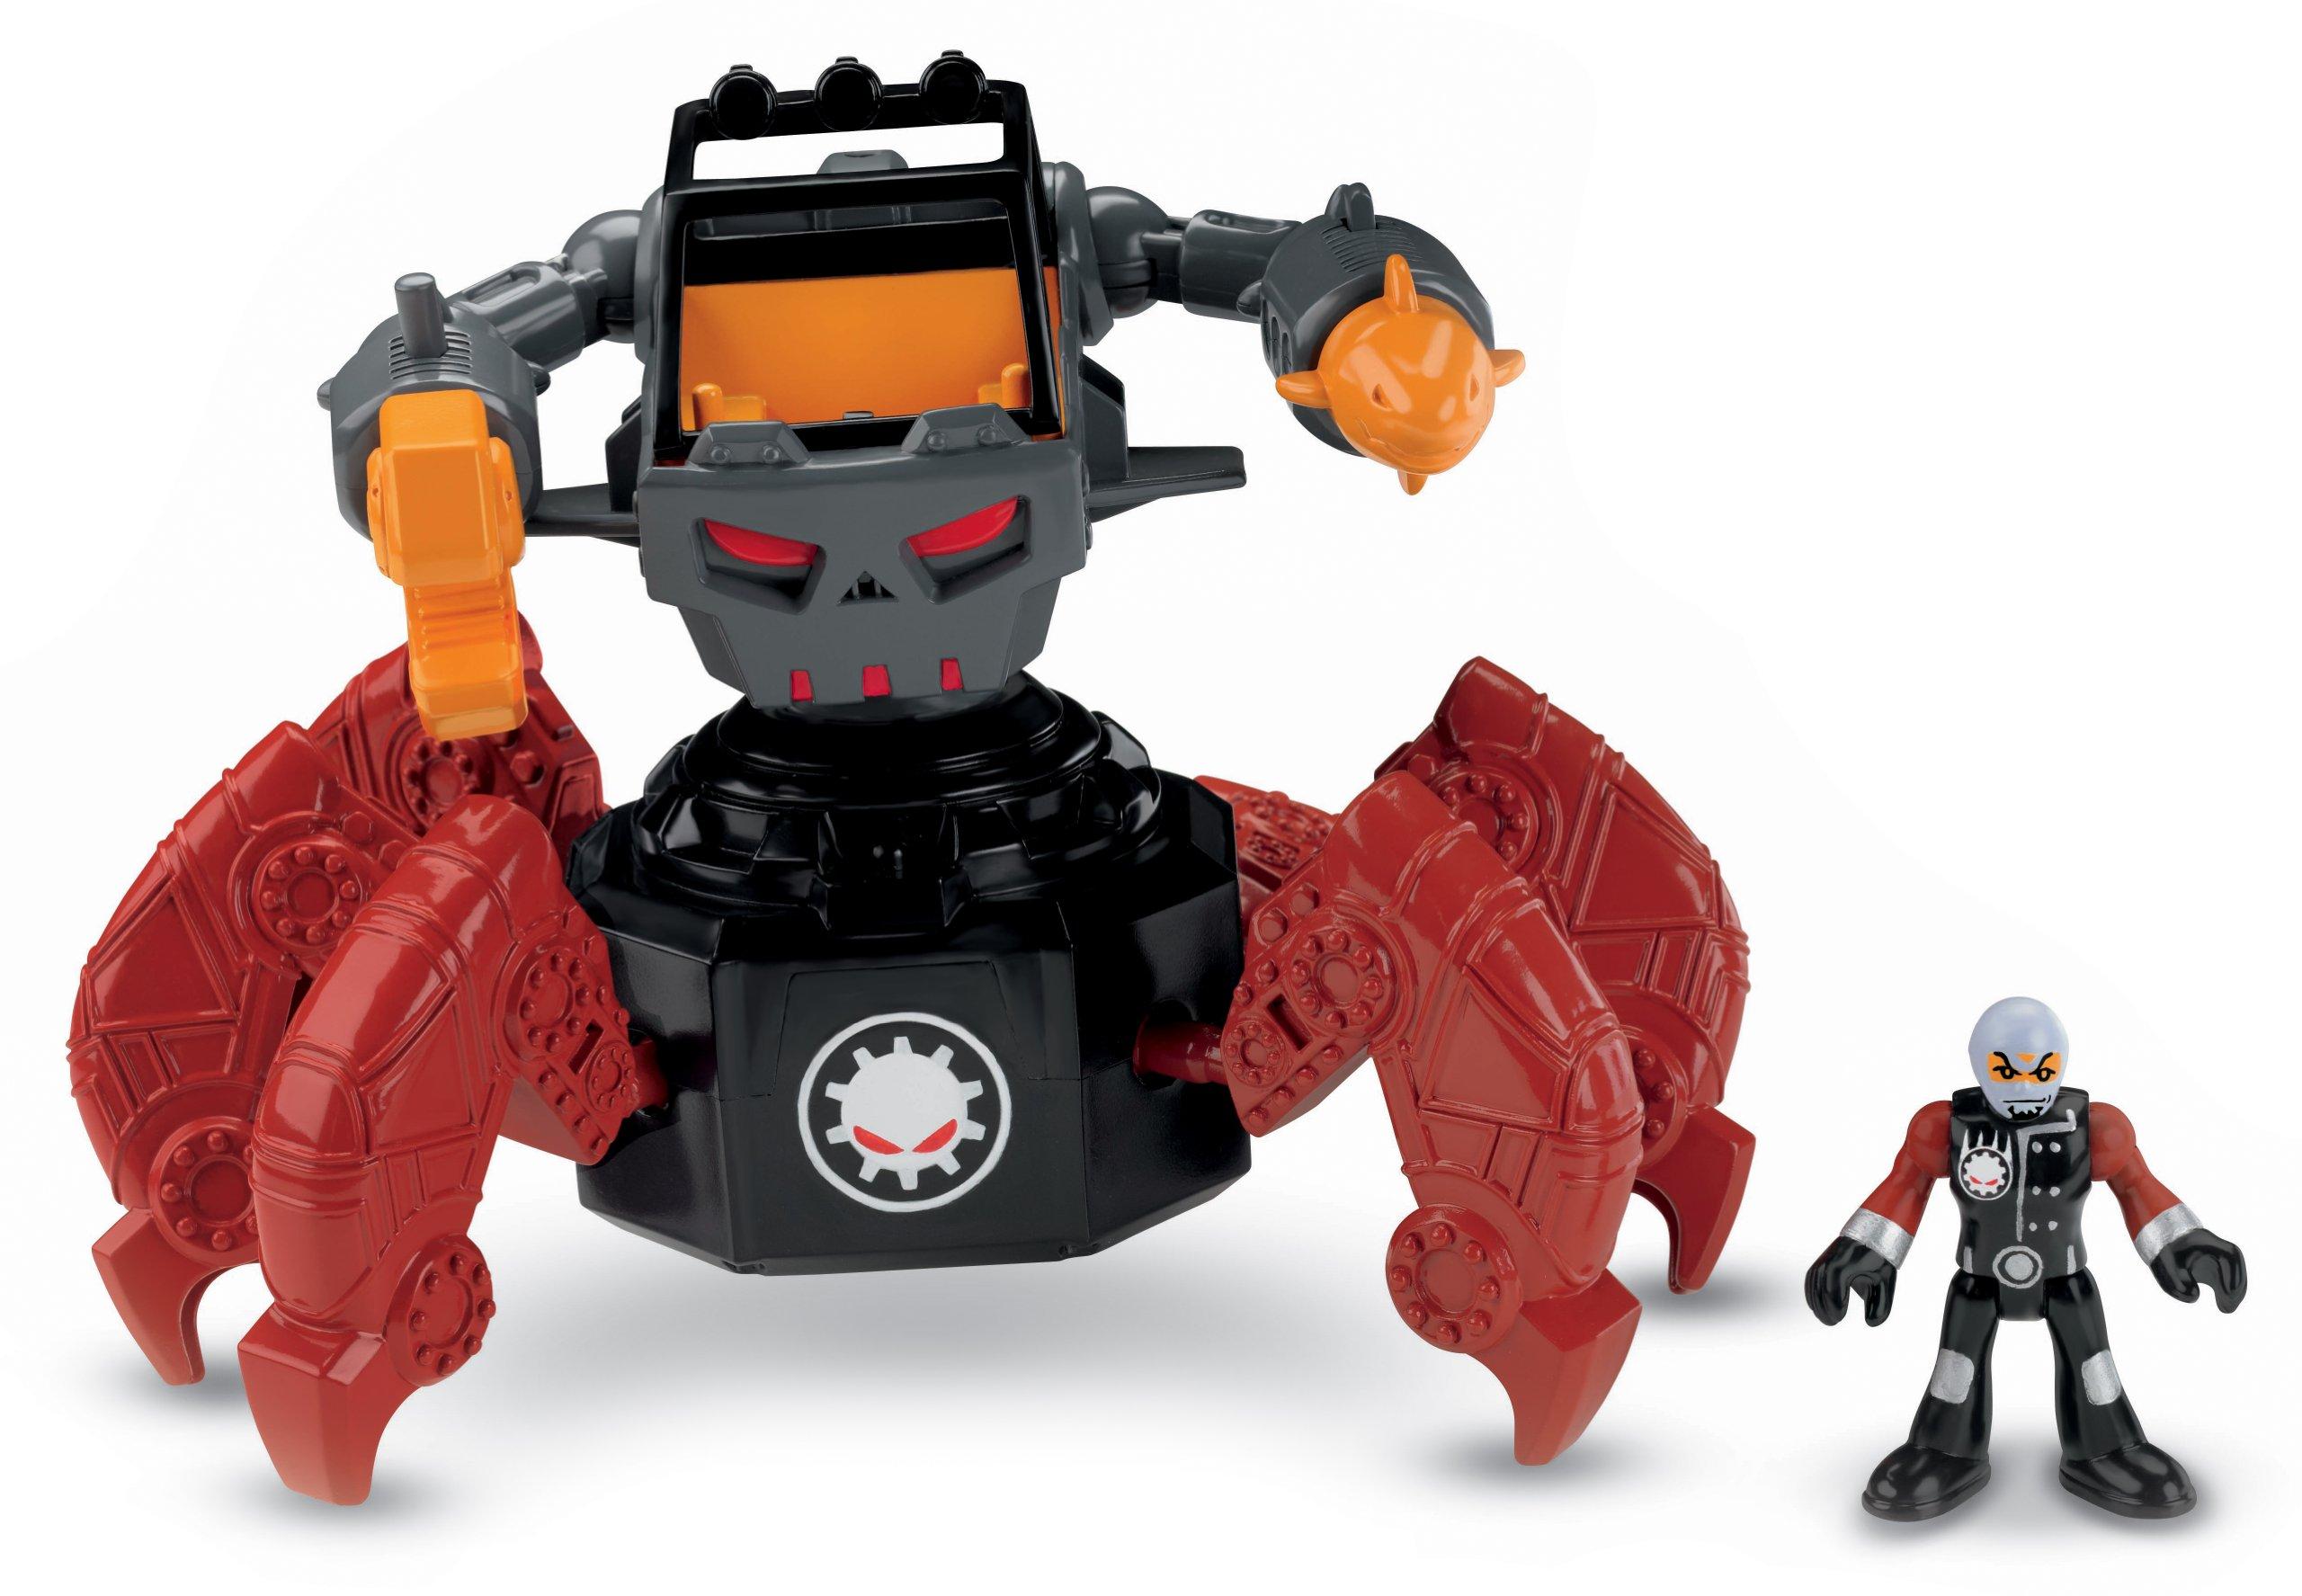 Fisher-Price Imaginext Robot Police - Motorized Villain Robot